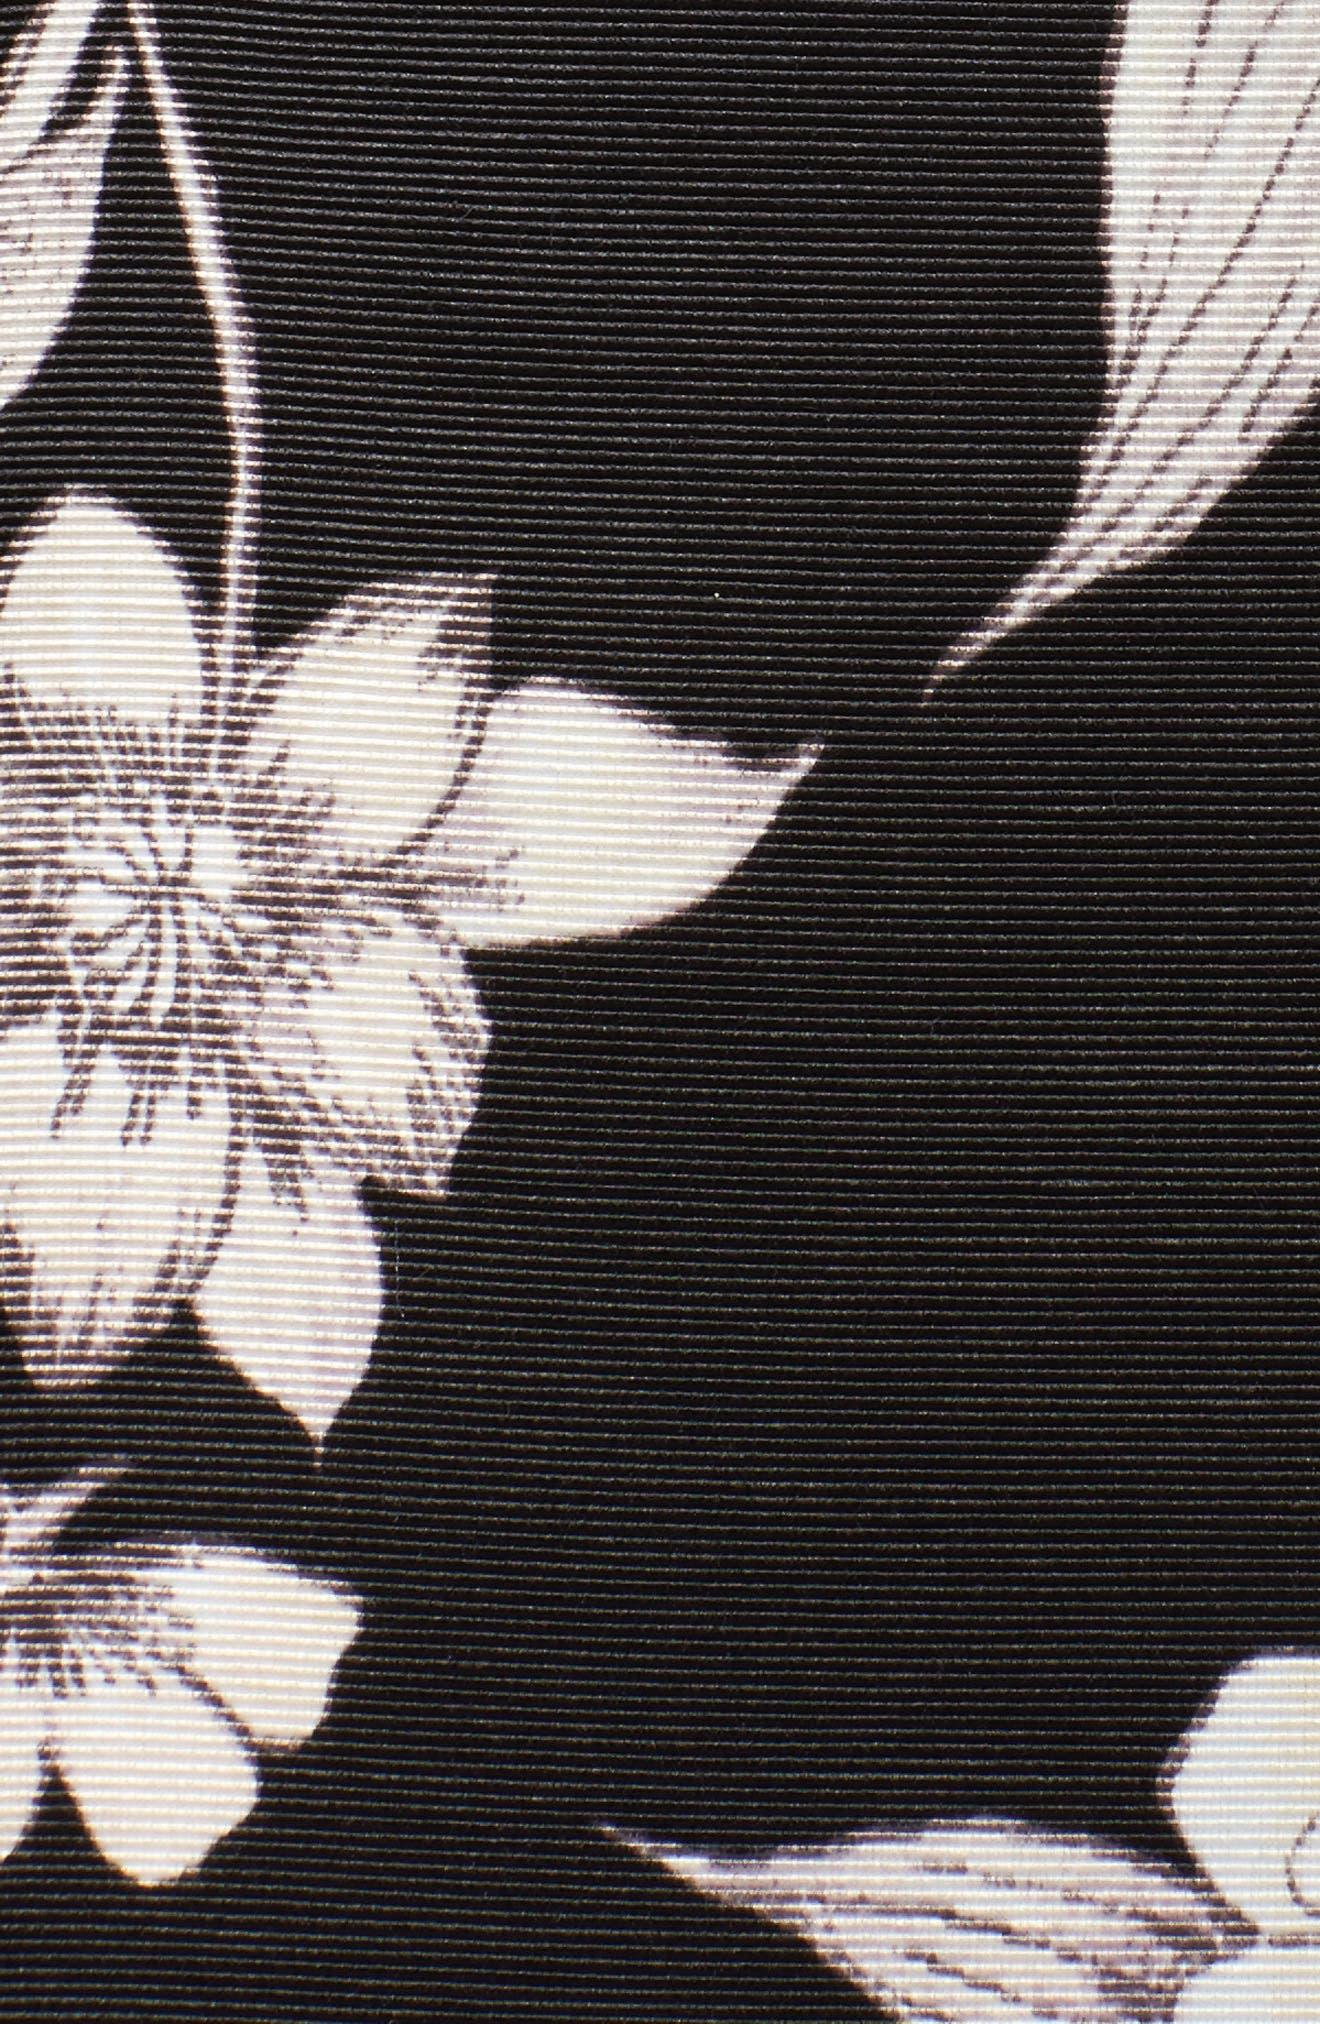 Floral Print Midi Skirt,                             Alternate thumbnail 5, color,                             003